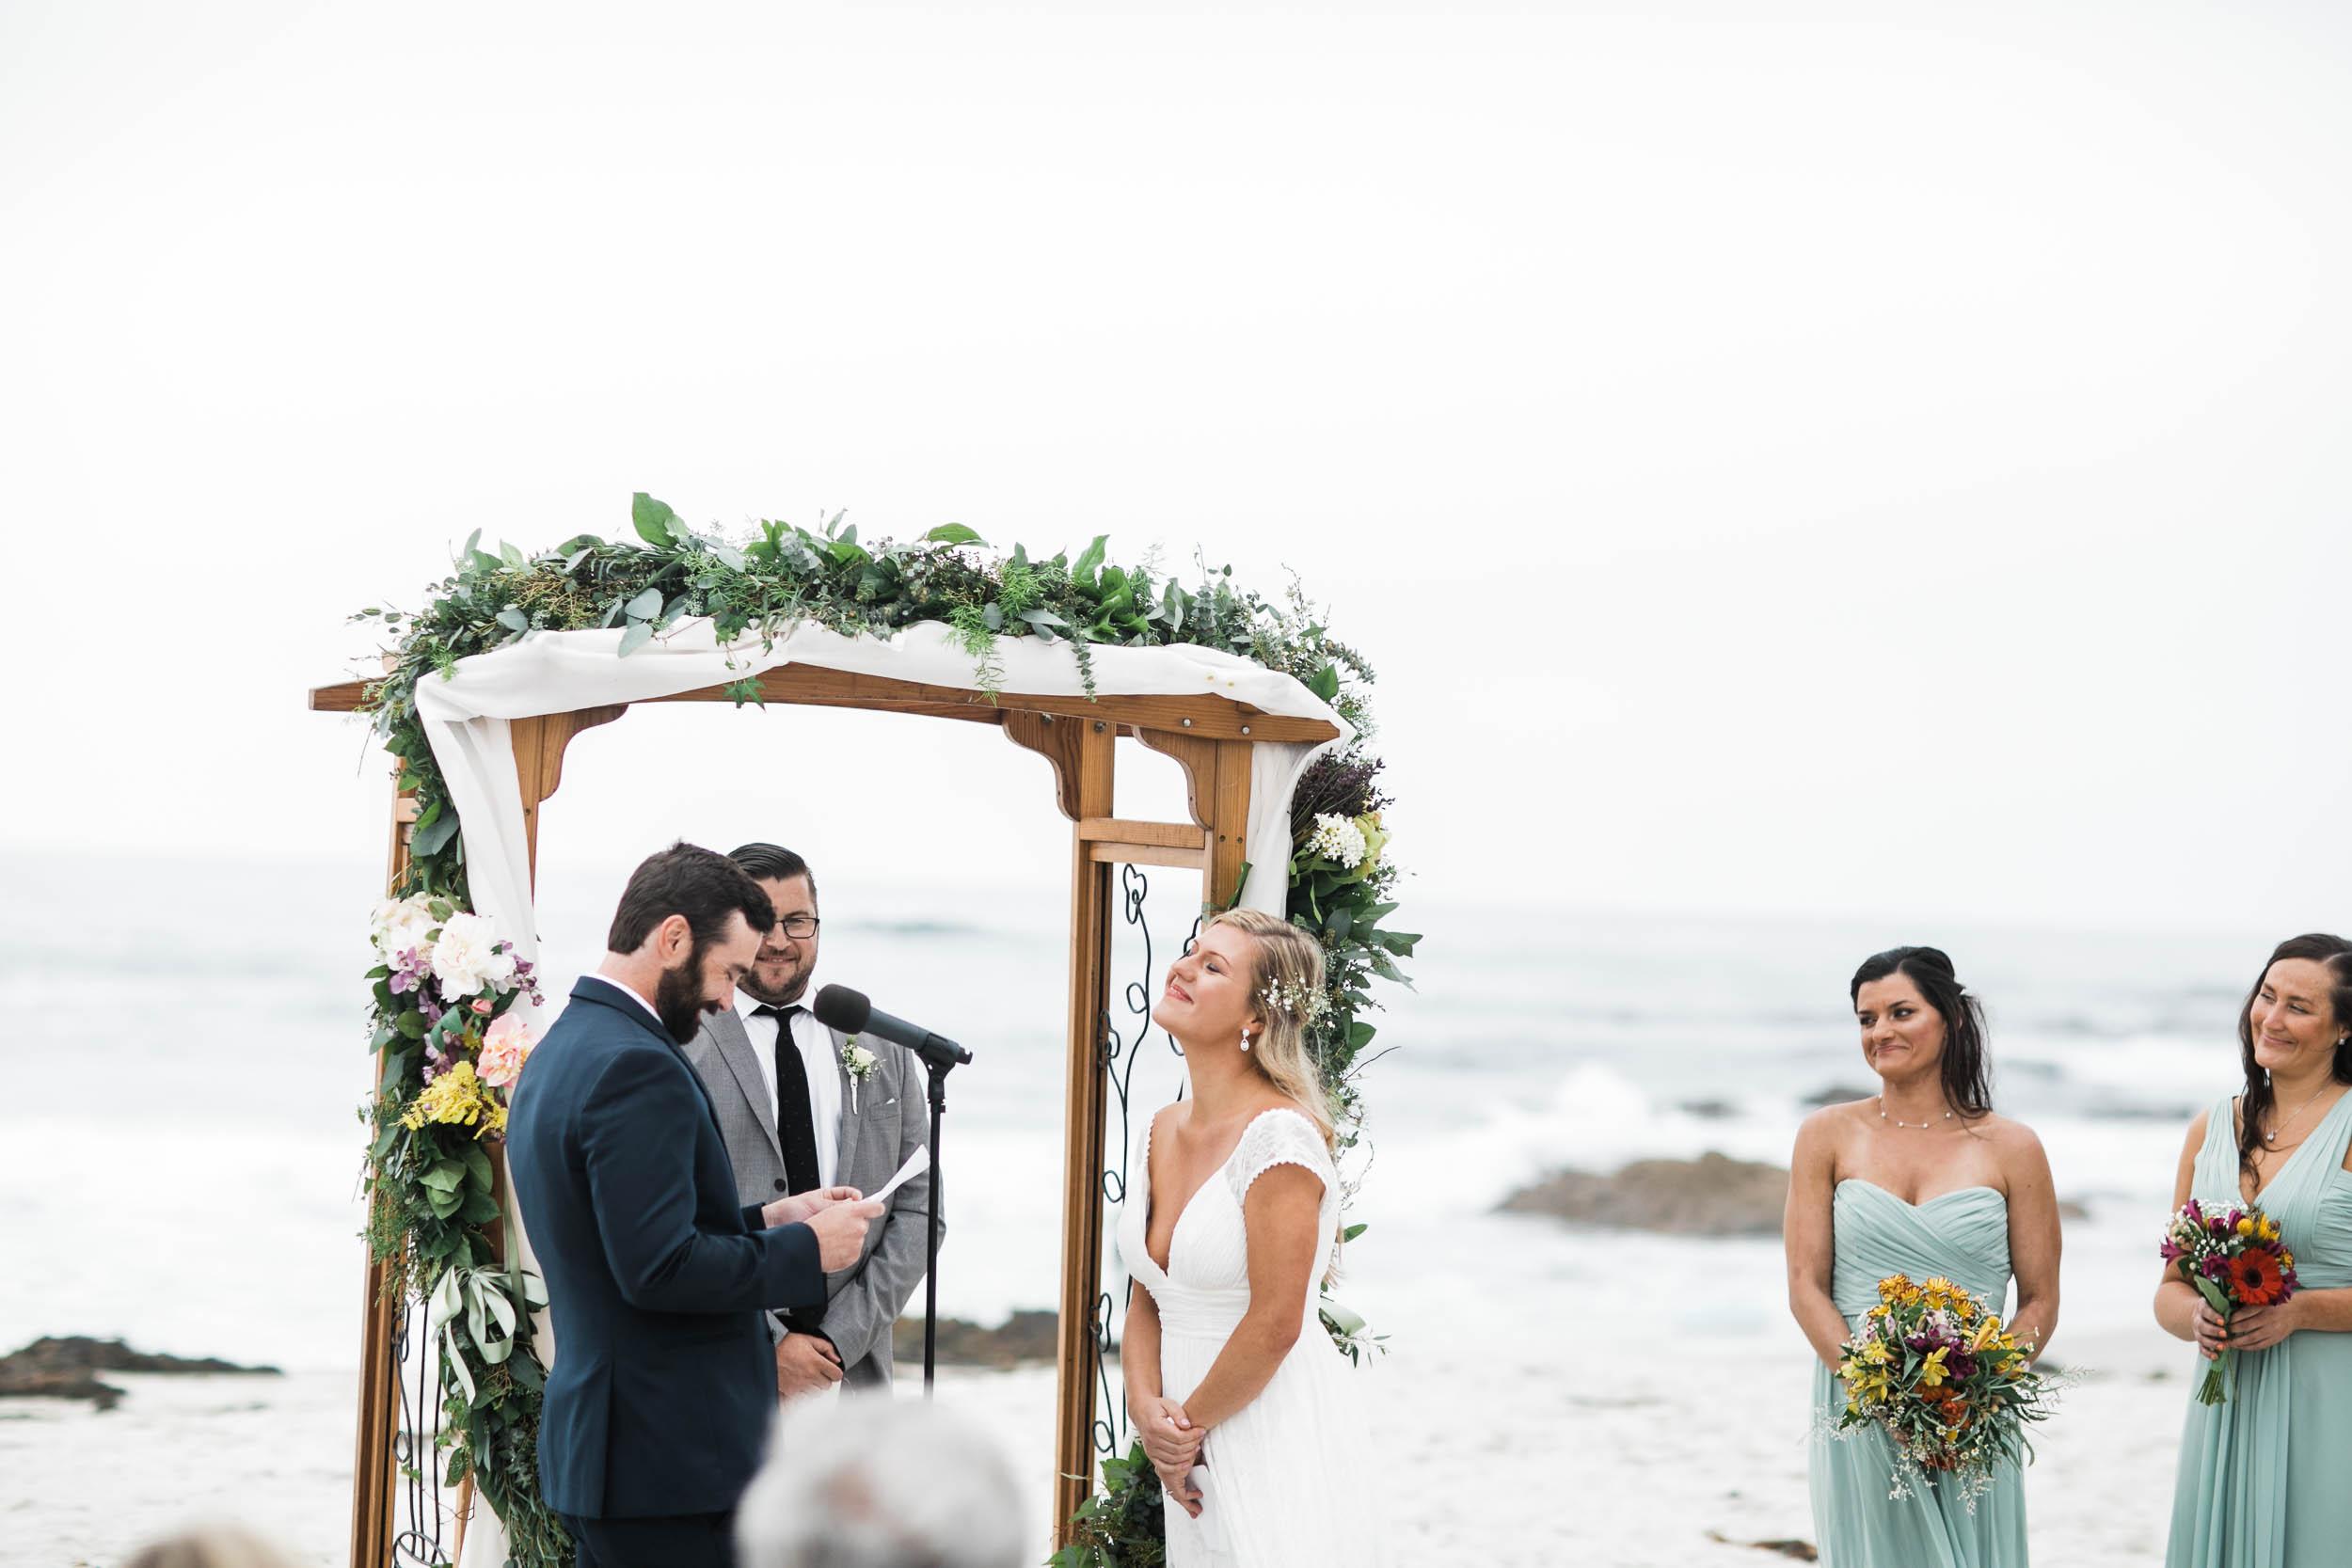 082617_C+K_Asilomar Pacific Grove Wedding_Buena Lane Photography_2486ER.jpg